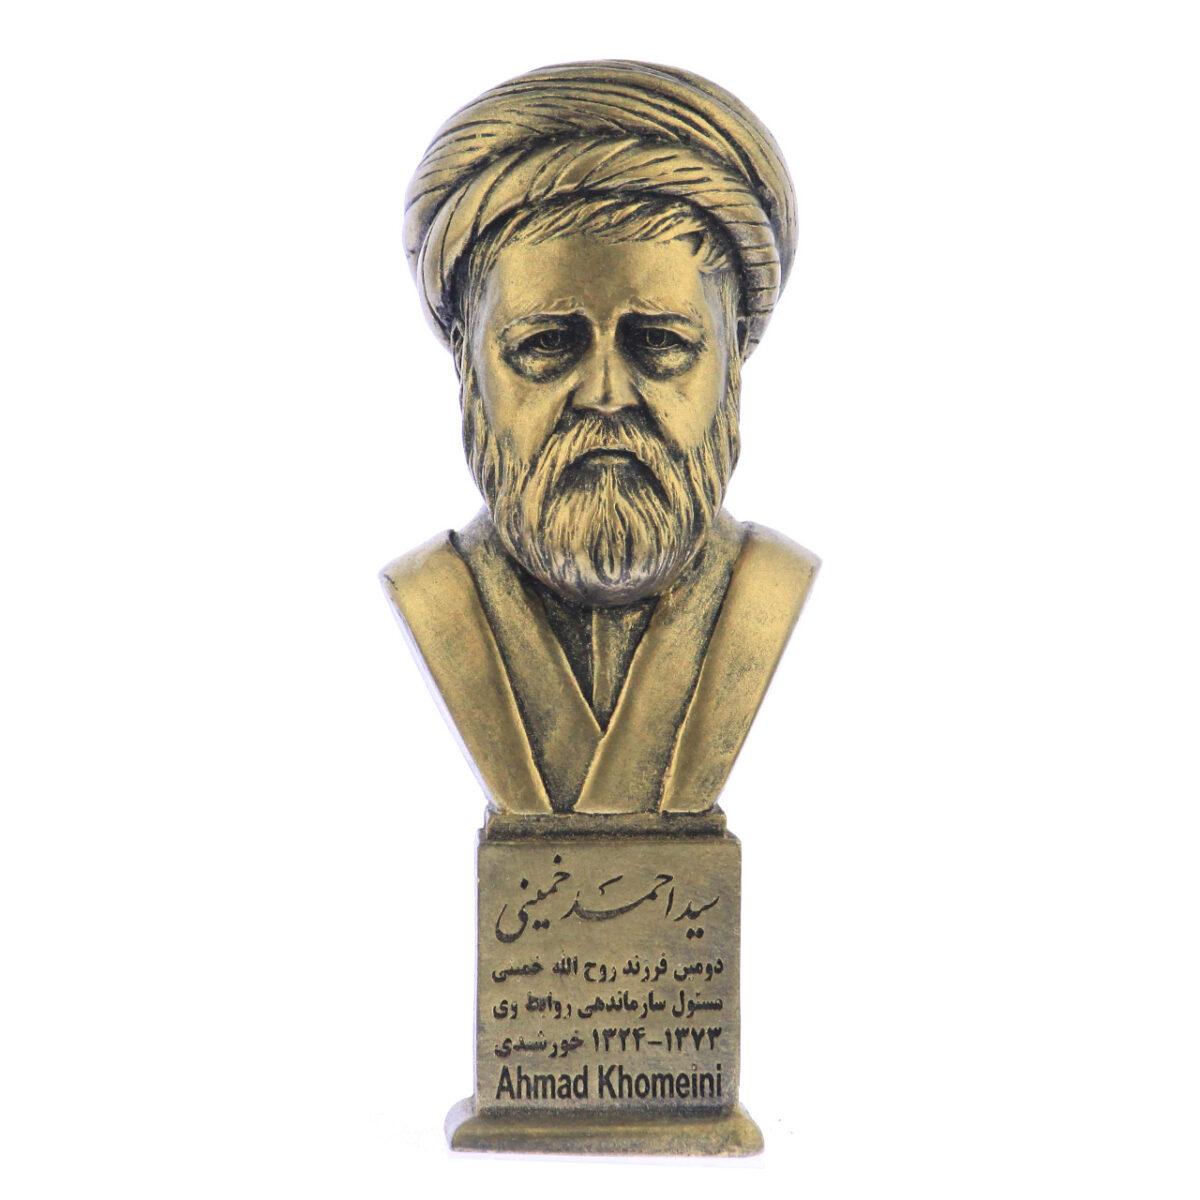 ahmad khomeini b 1200x1200 - سردیس سید احمد خمینی